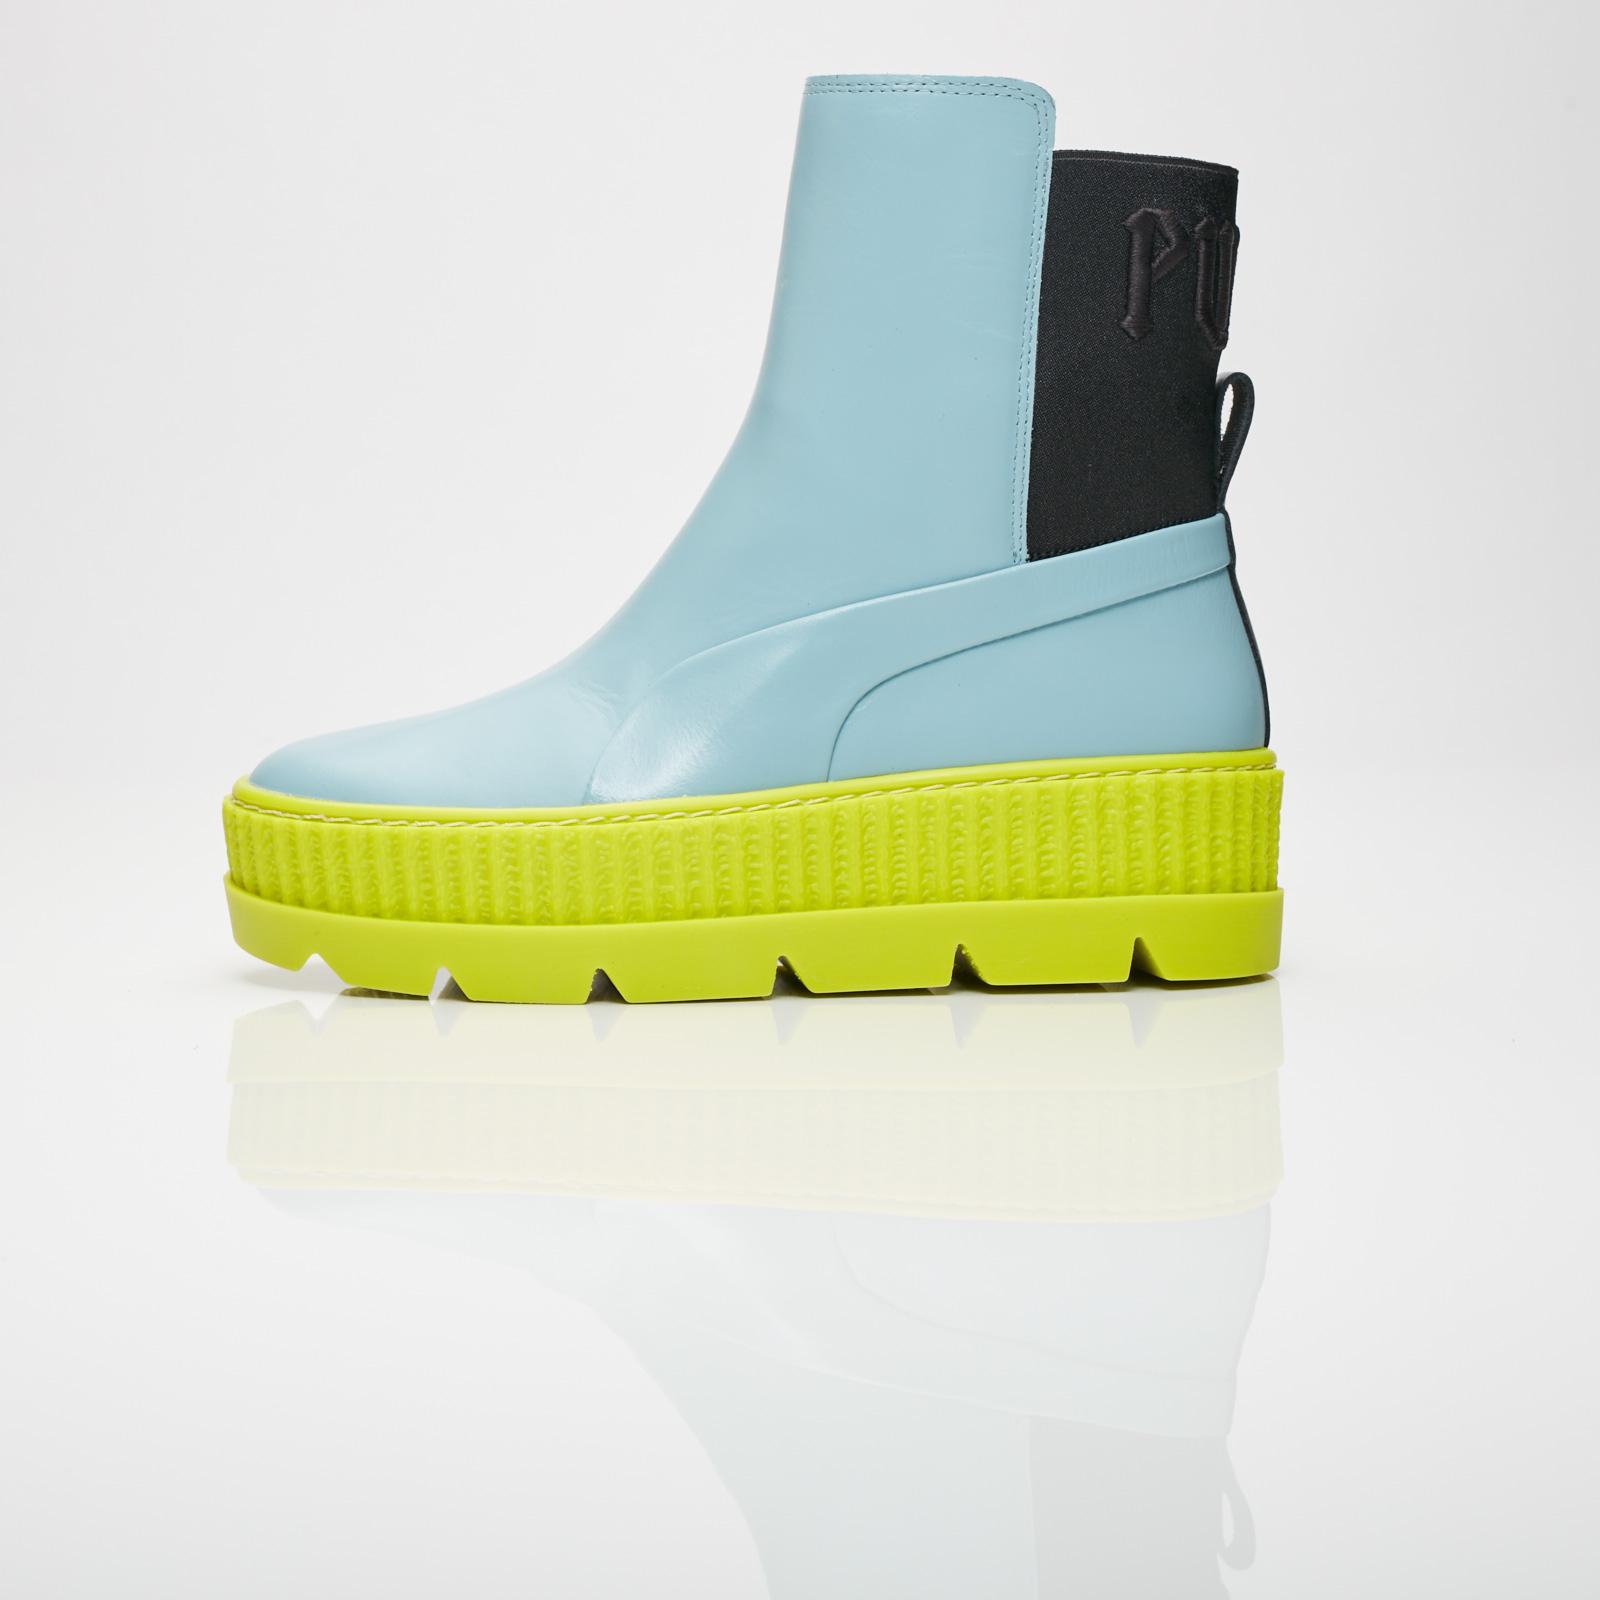 brand new efee8 52b7e Puma Chelsea Sneaker Boot Wns - 366266-01 - Sneakersnstuff ...